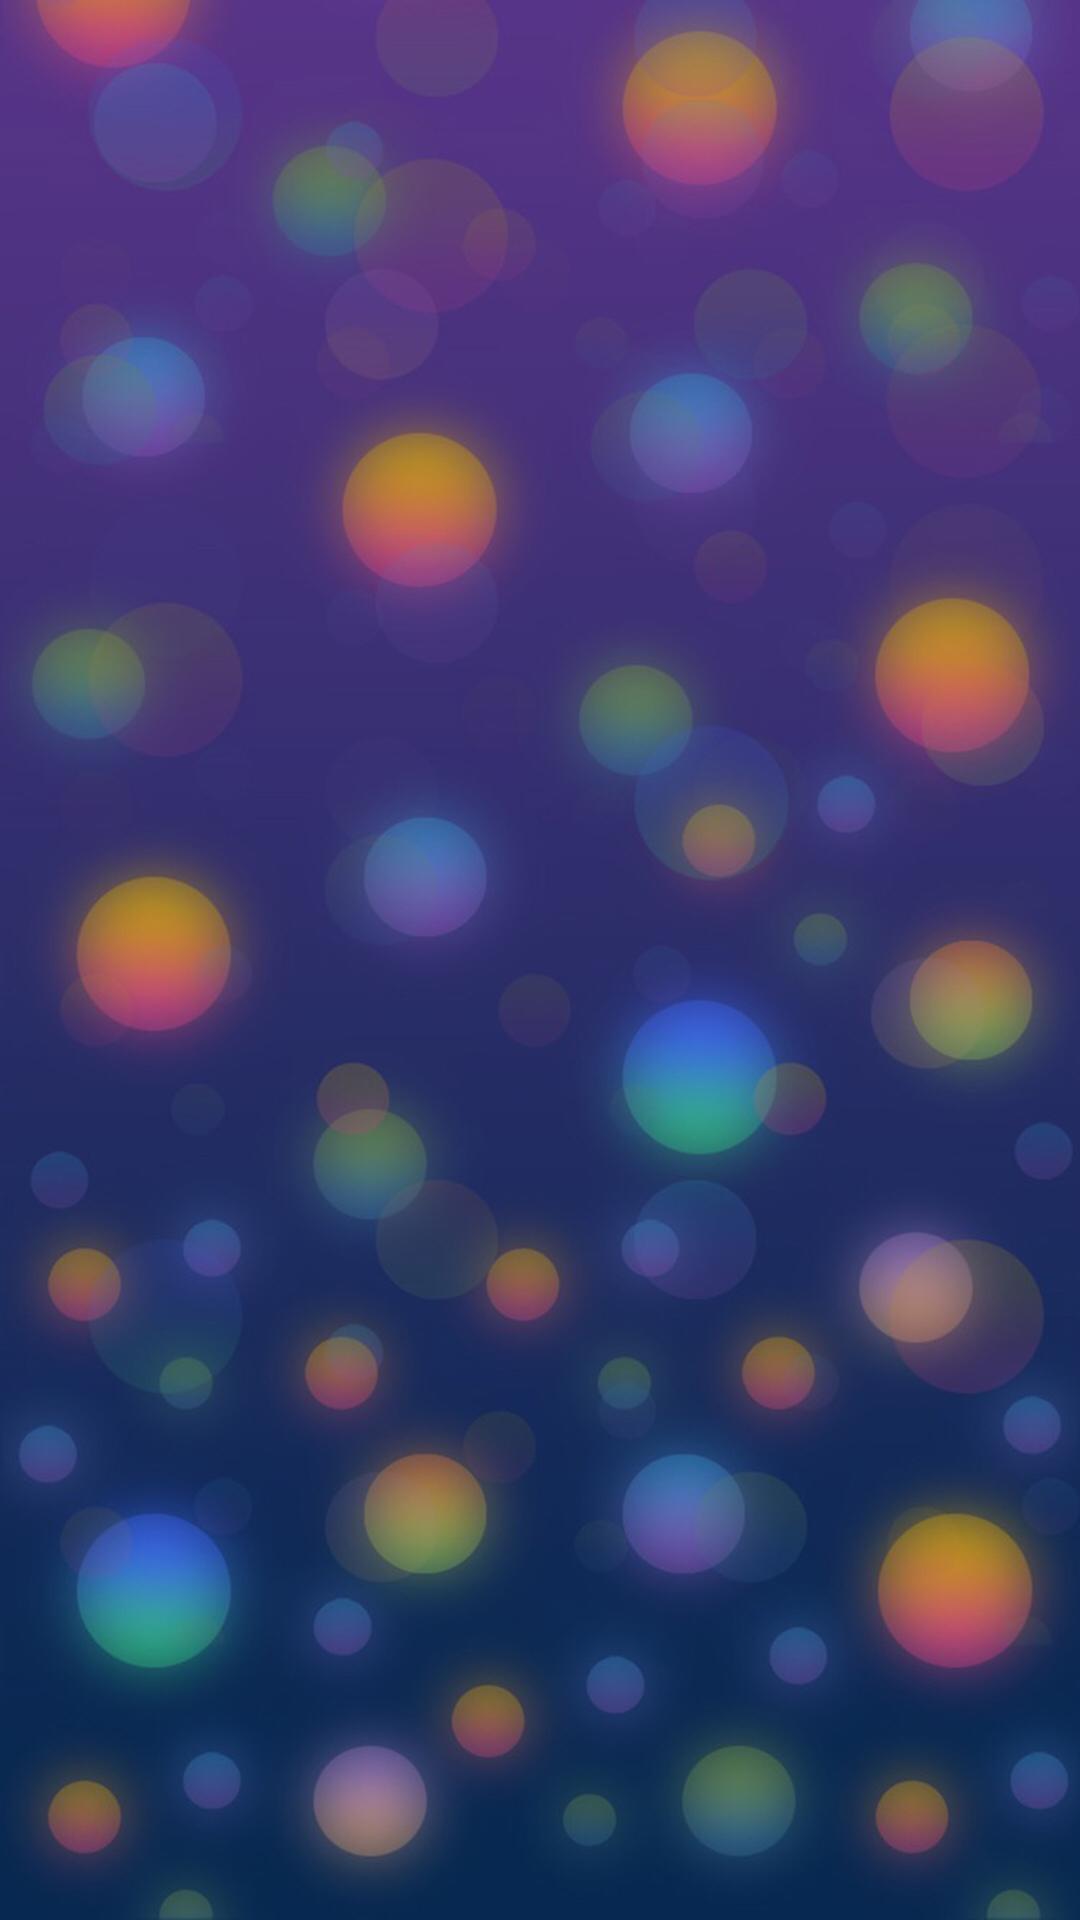 Christmas Balls v2 iPhone Wallpaper AR7